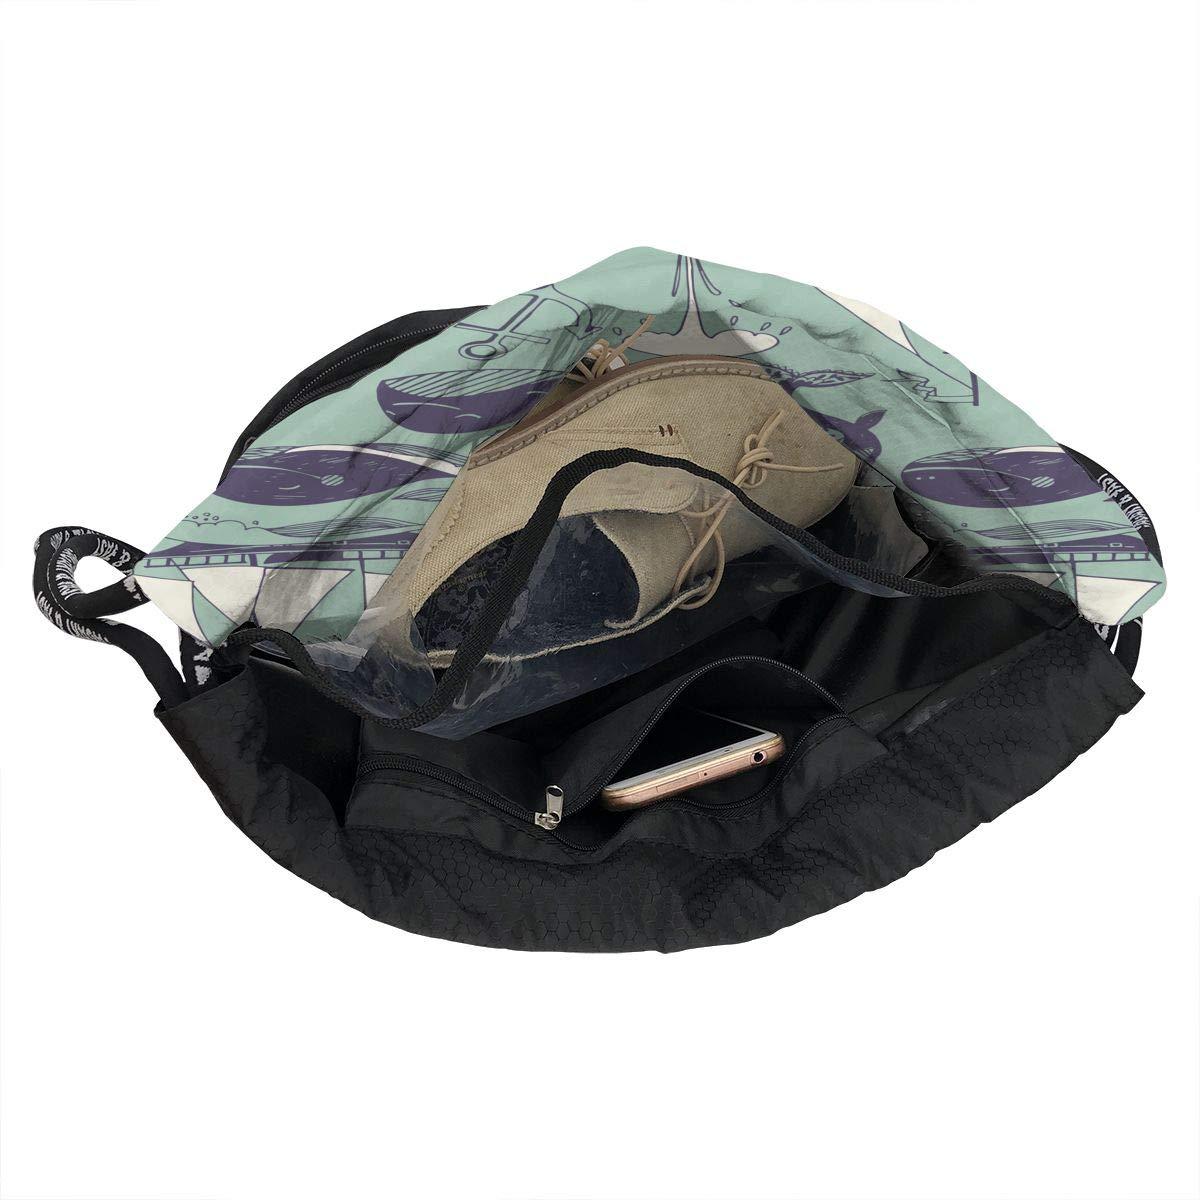 Zol1Q Lightweight Waterproof Large Storage Drawstring Bag for Men /& Women Whale Ship Cinch Backpack Sackpack Tote Sack